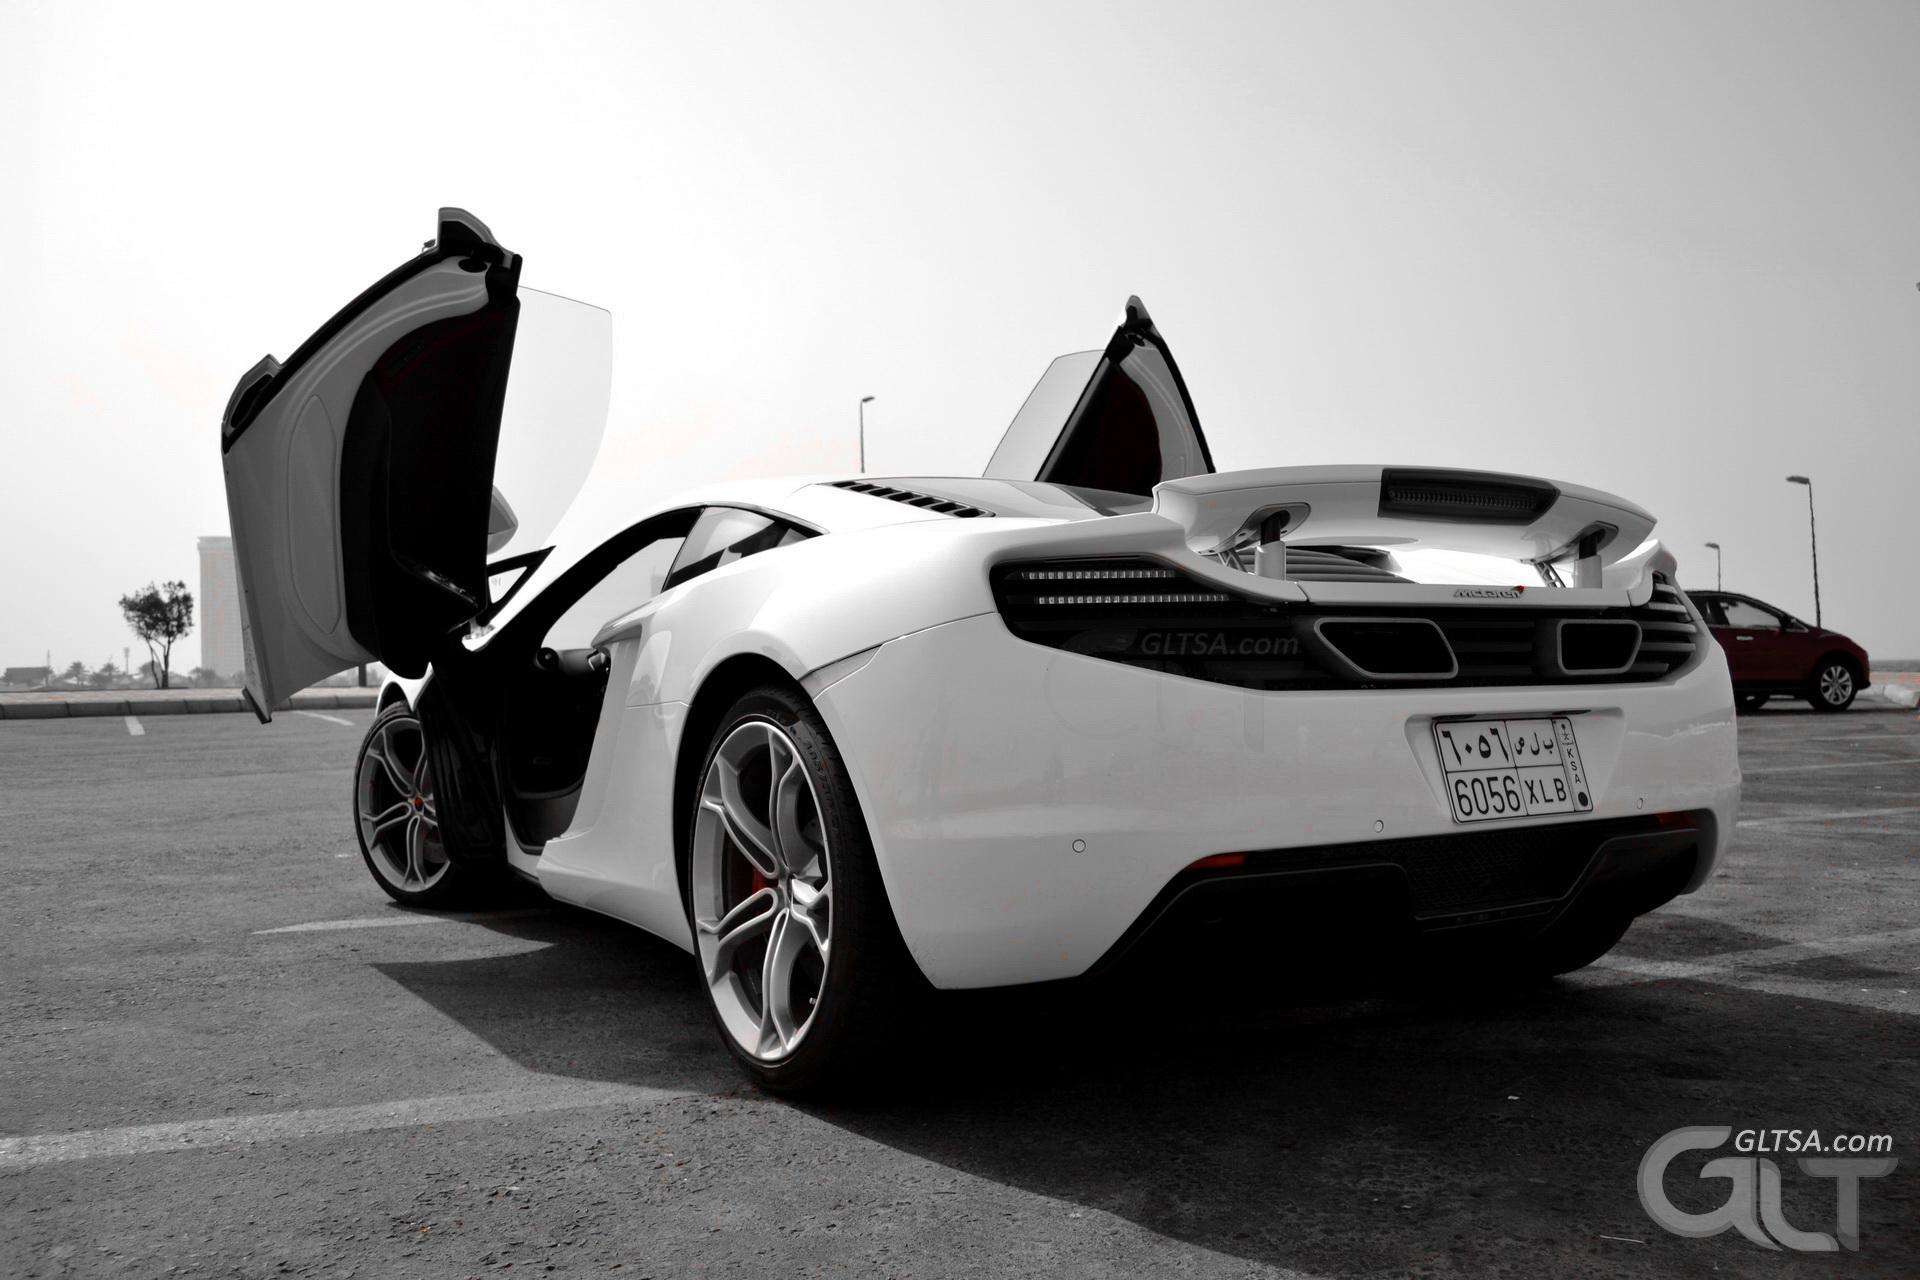 Hintergrundbilder : Weiß, Auto, Innere, Fahrzeug, Fotografie, Kanon ...